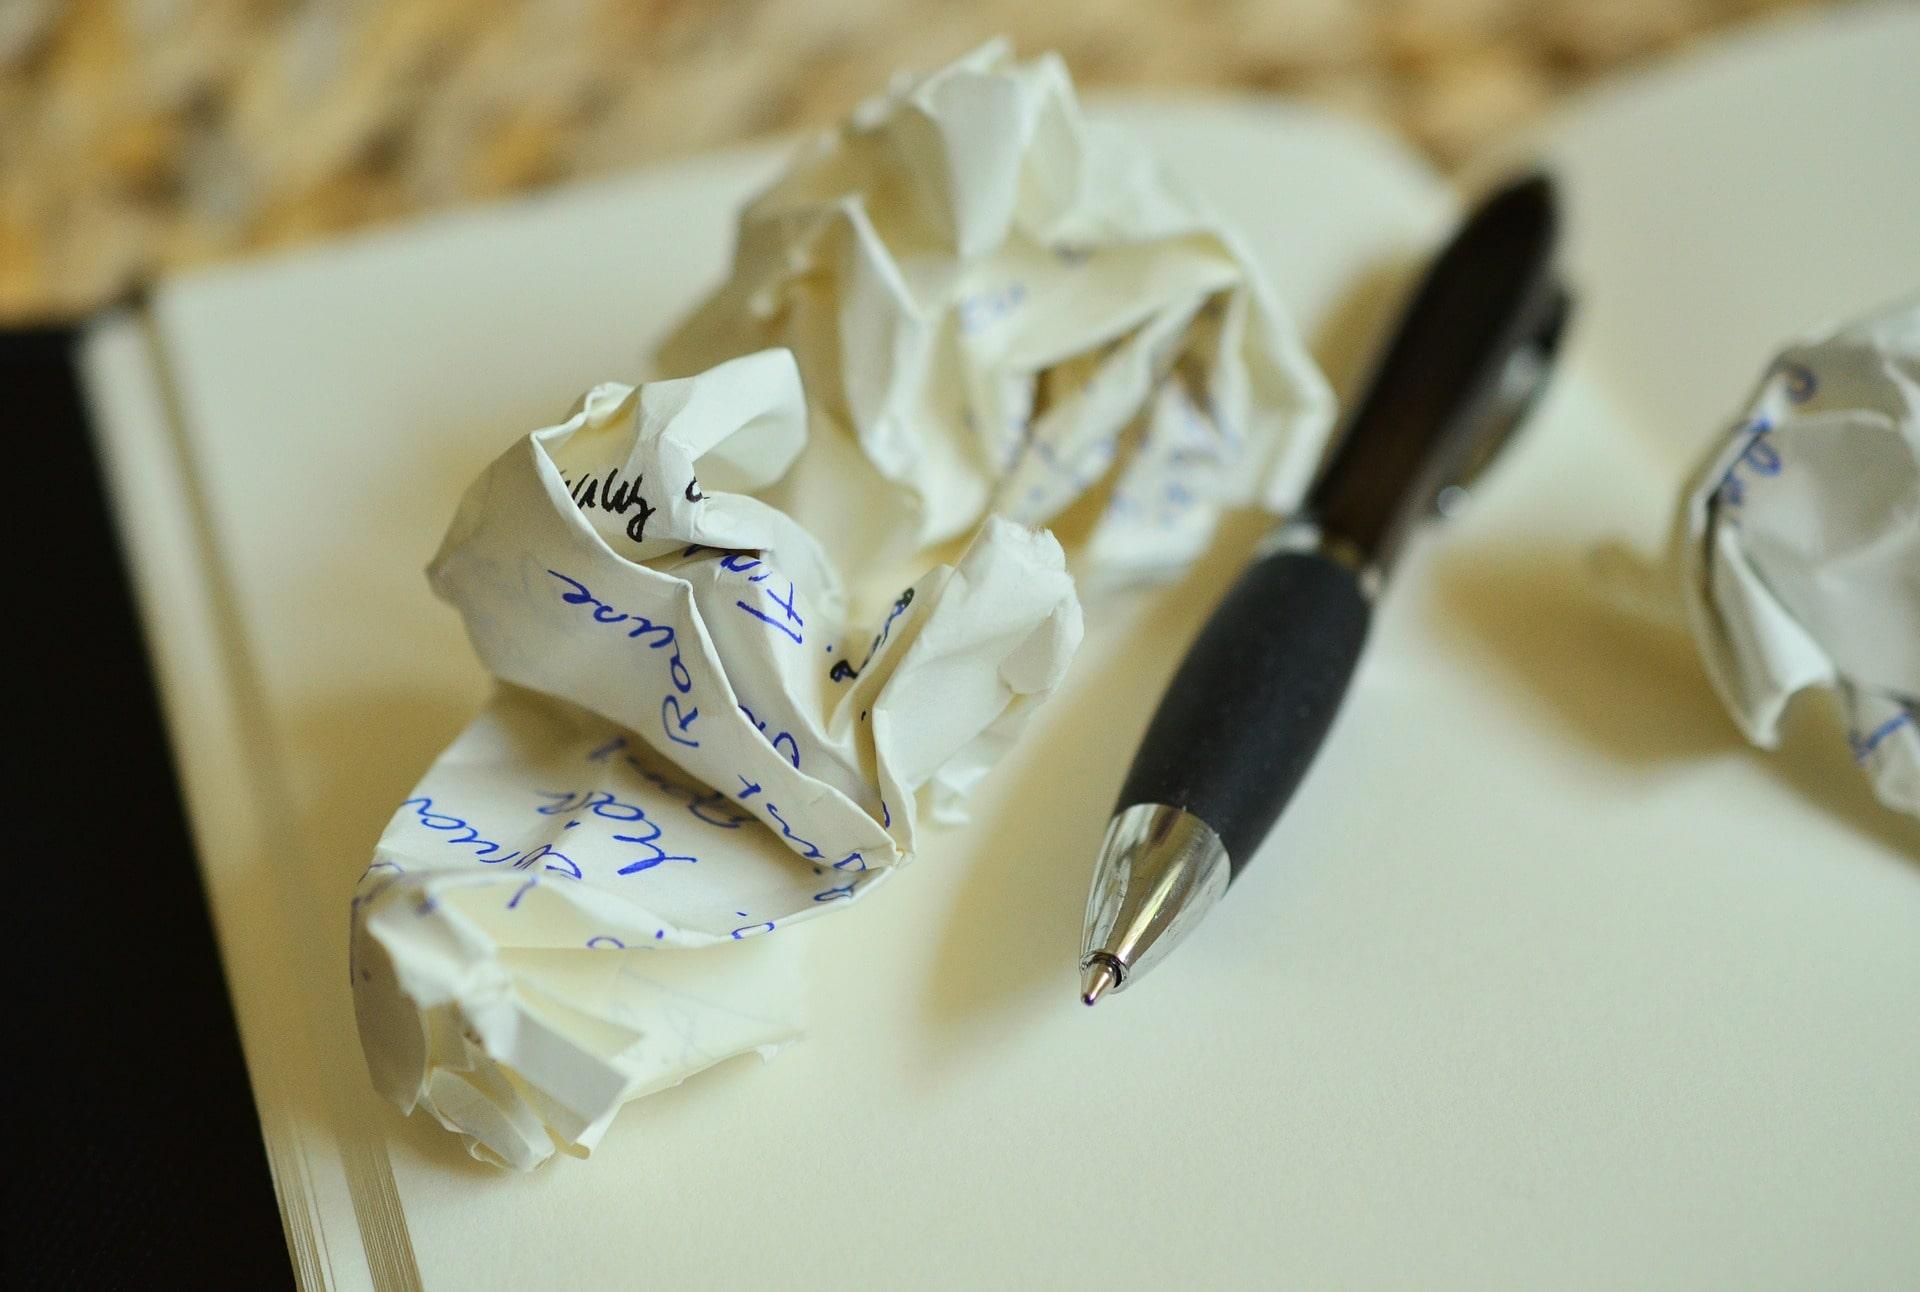 soft delete - zniszczone notatki